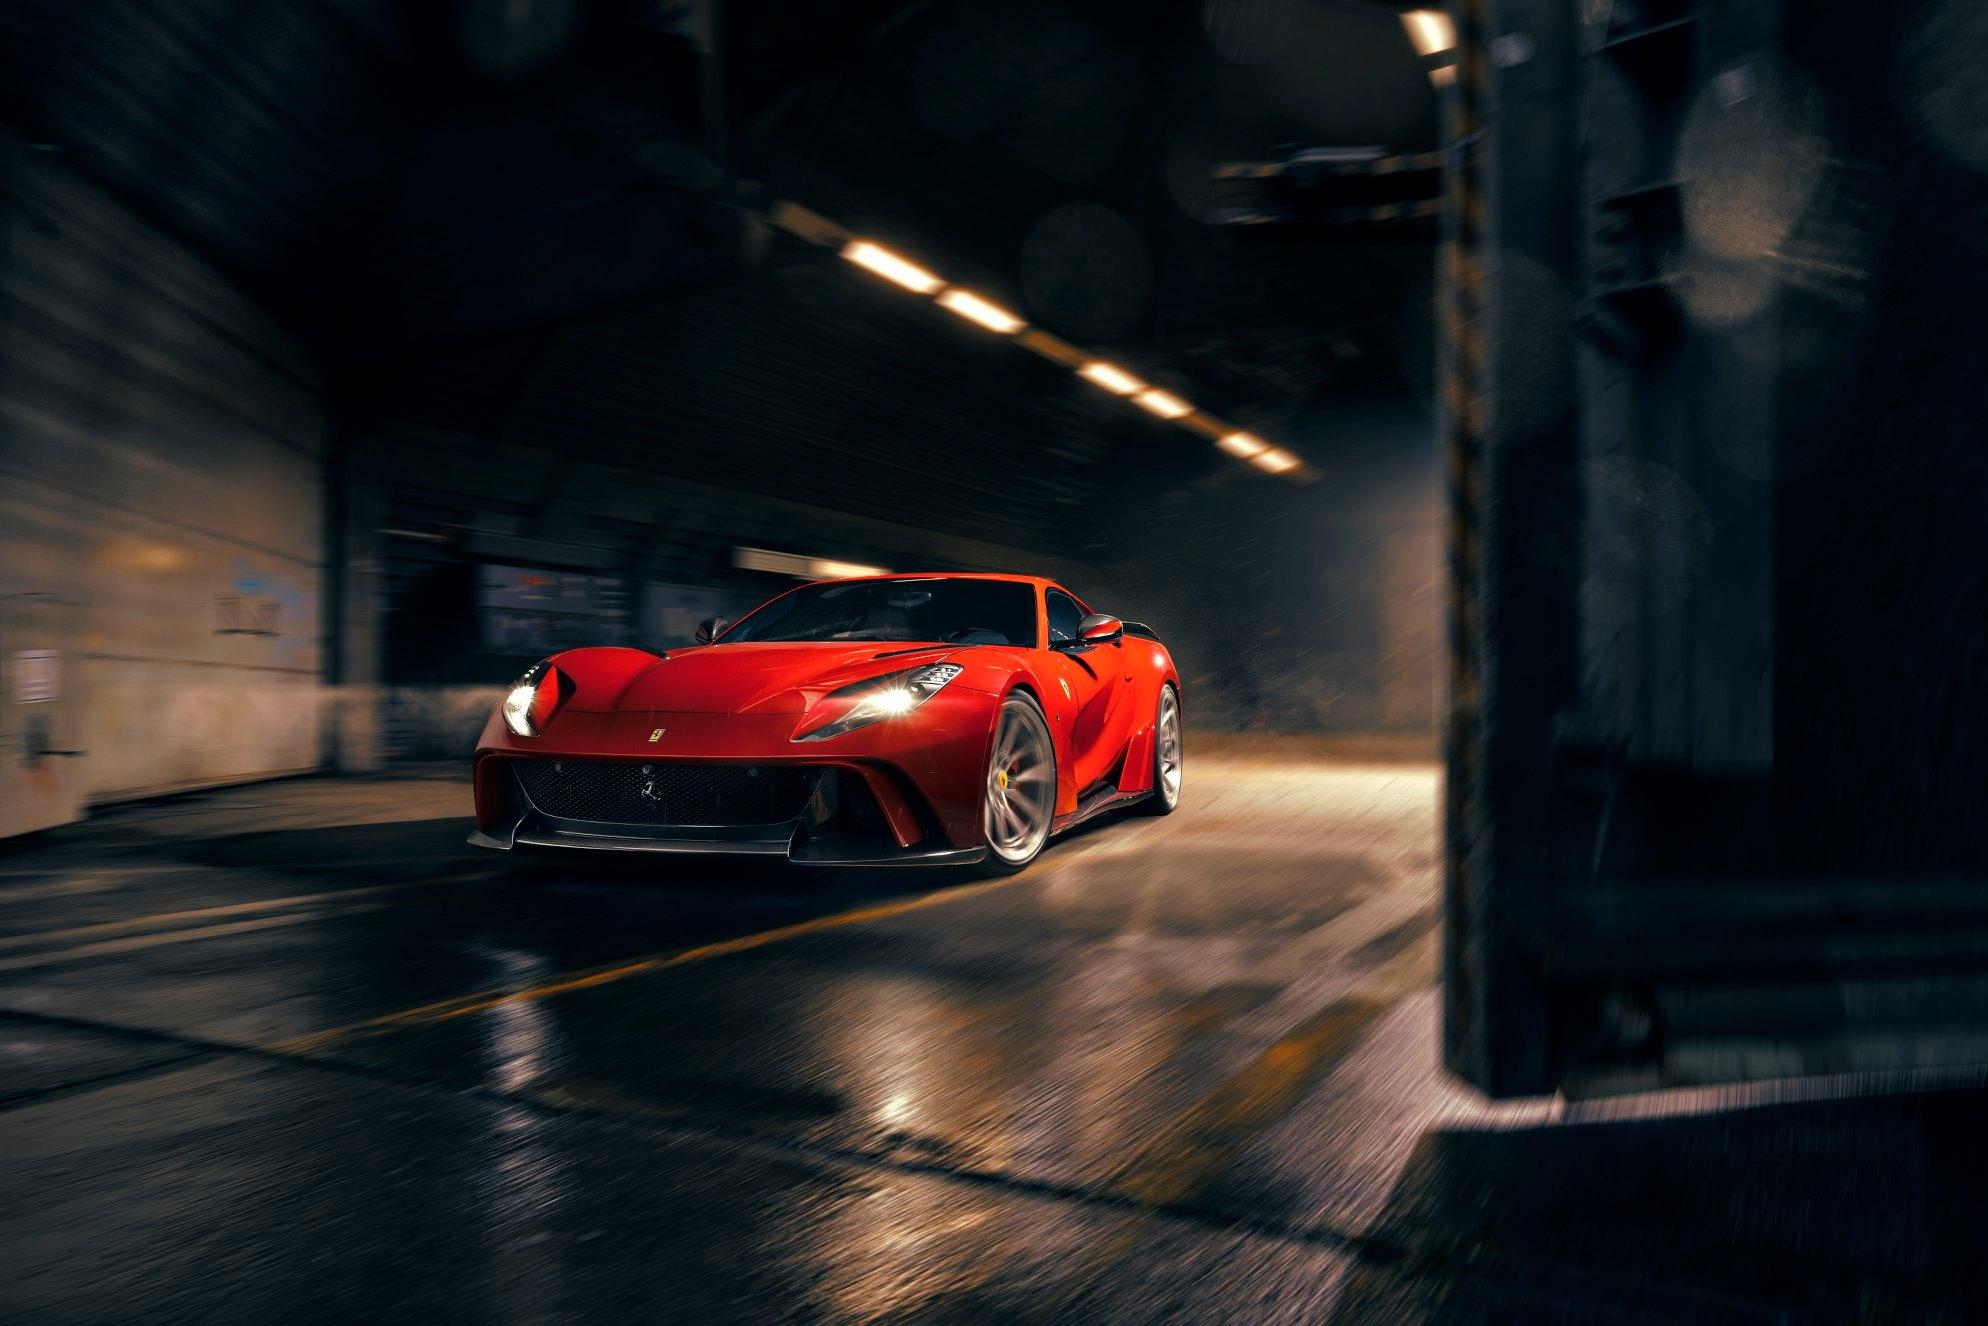 Ferrari-812-Superfast-N-Largo-by-Novitec-13